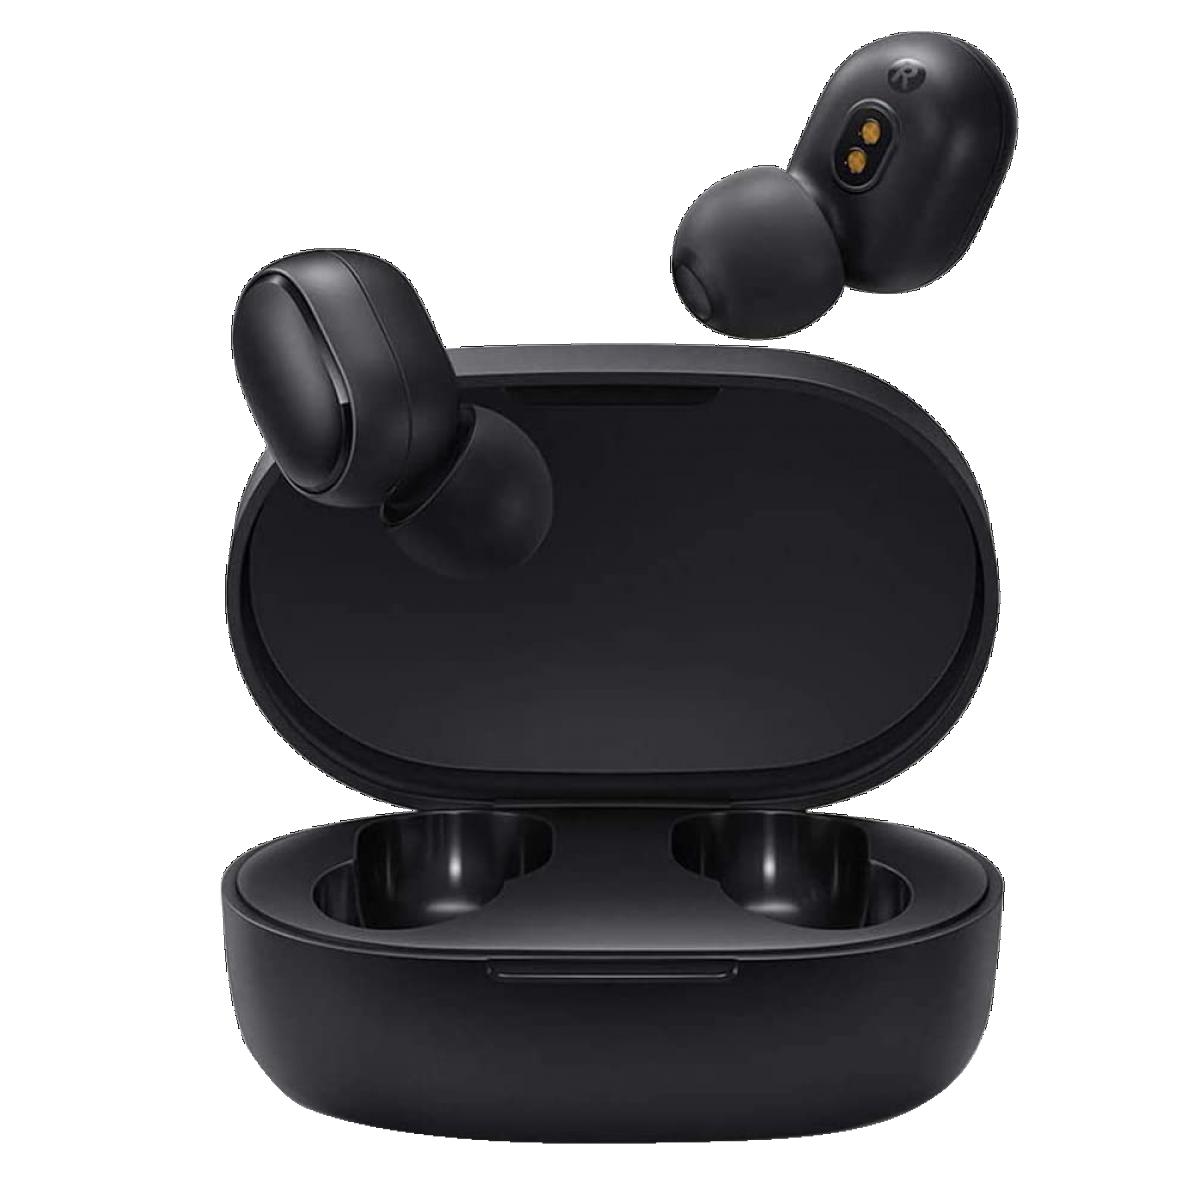 Fone de Ouvido Bluetooth Xiaomi Mi True Wireless Earbuds Basic 2, Black